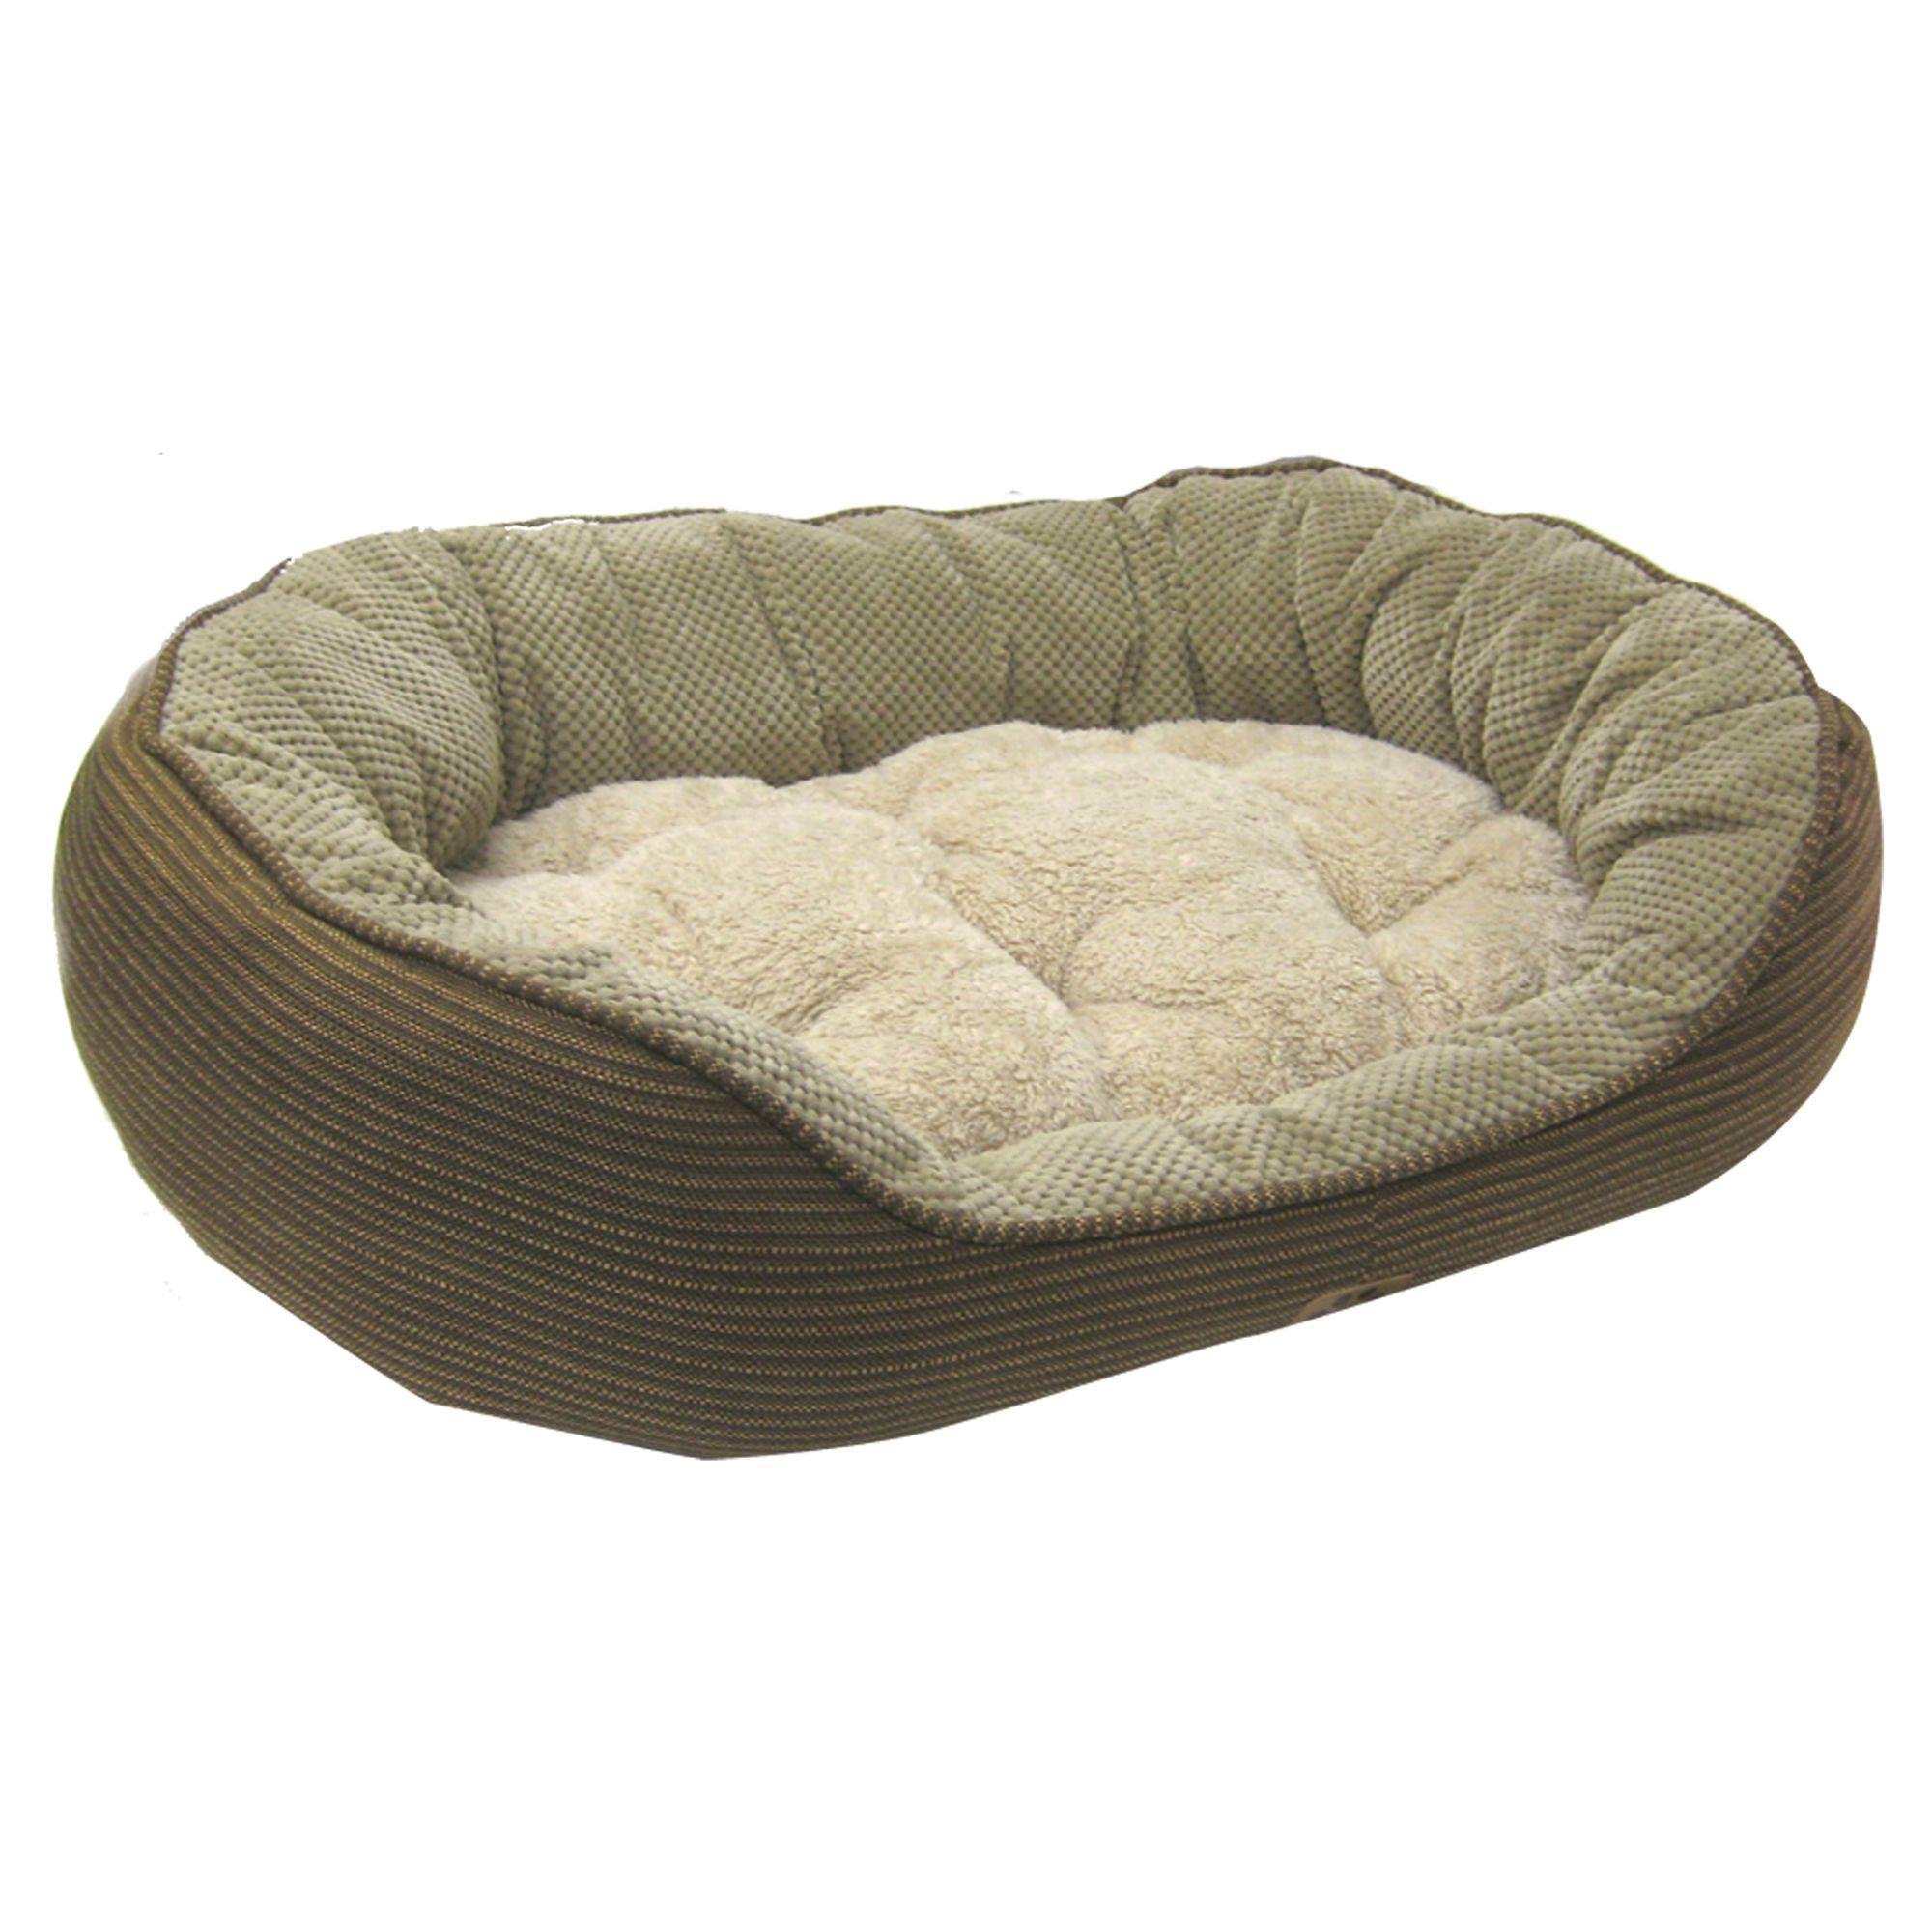 Precision Pet Daydreamer Pet Bed Size 26l X 22w X 10h Brown